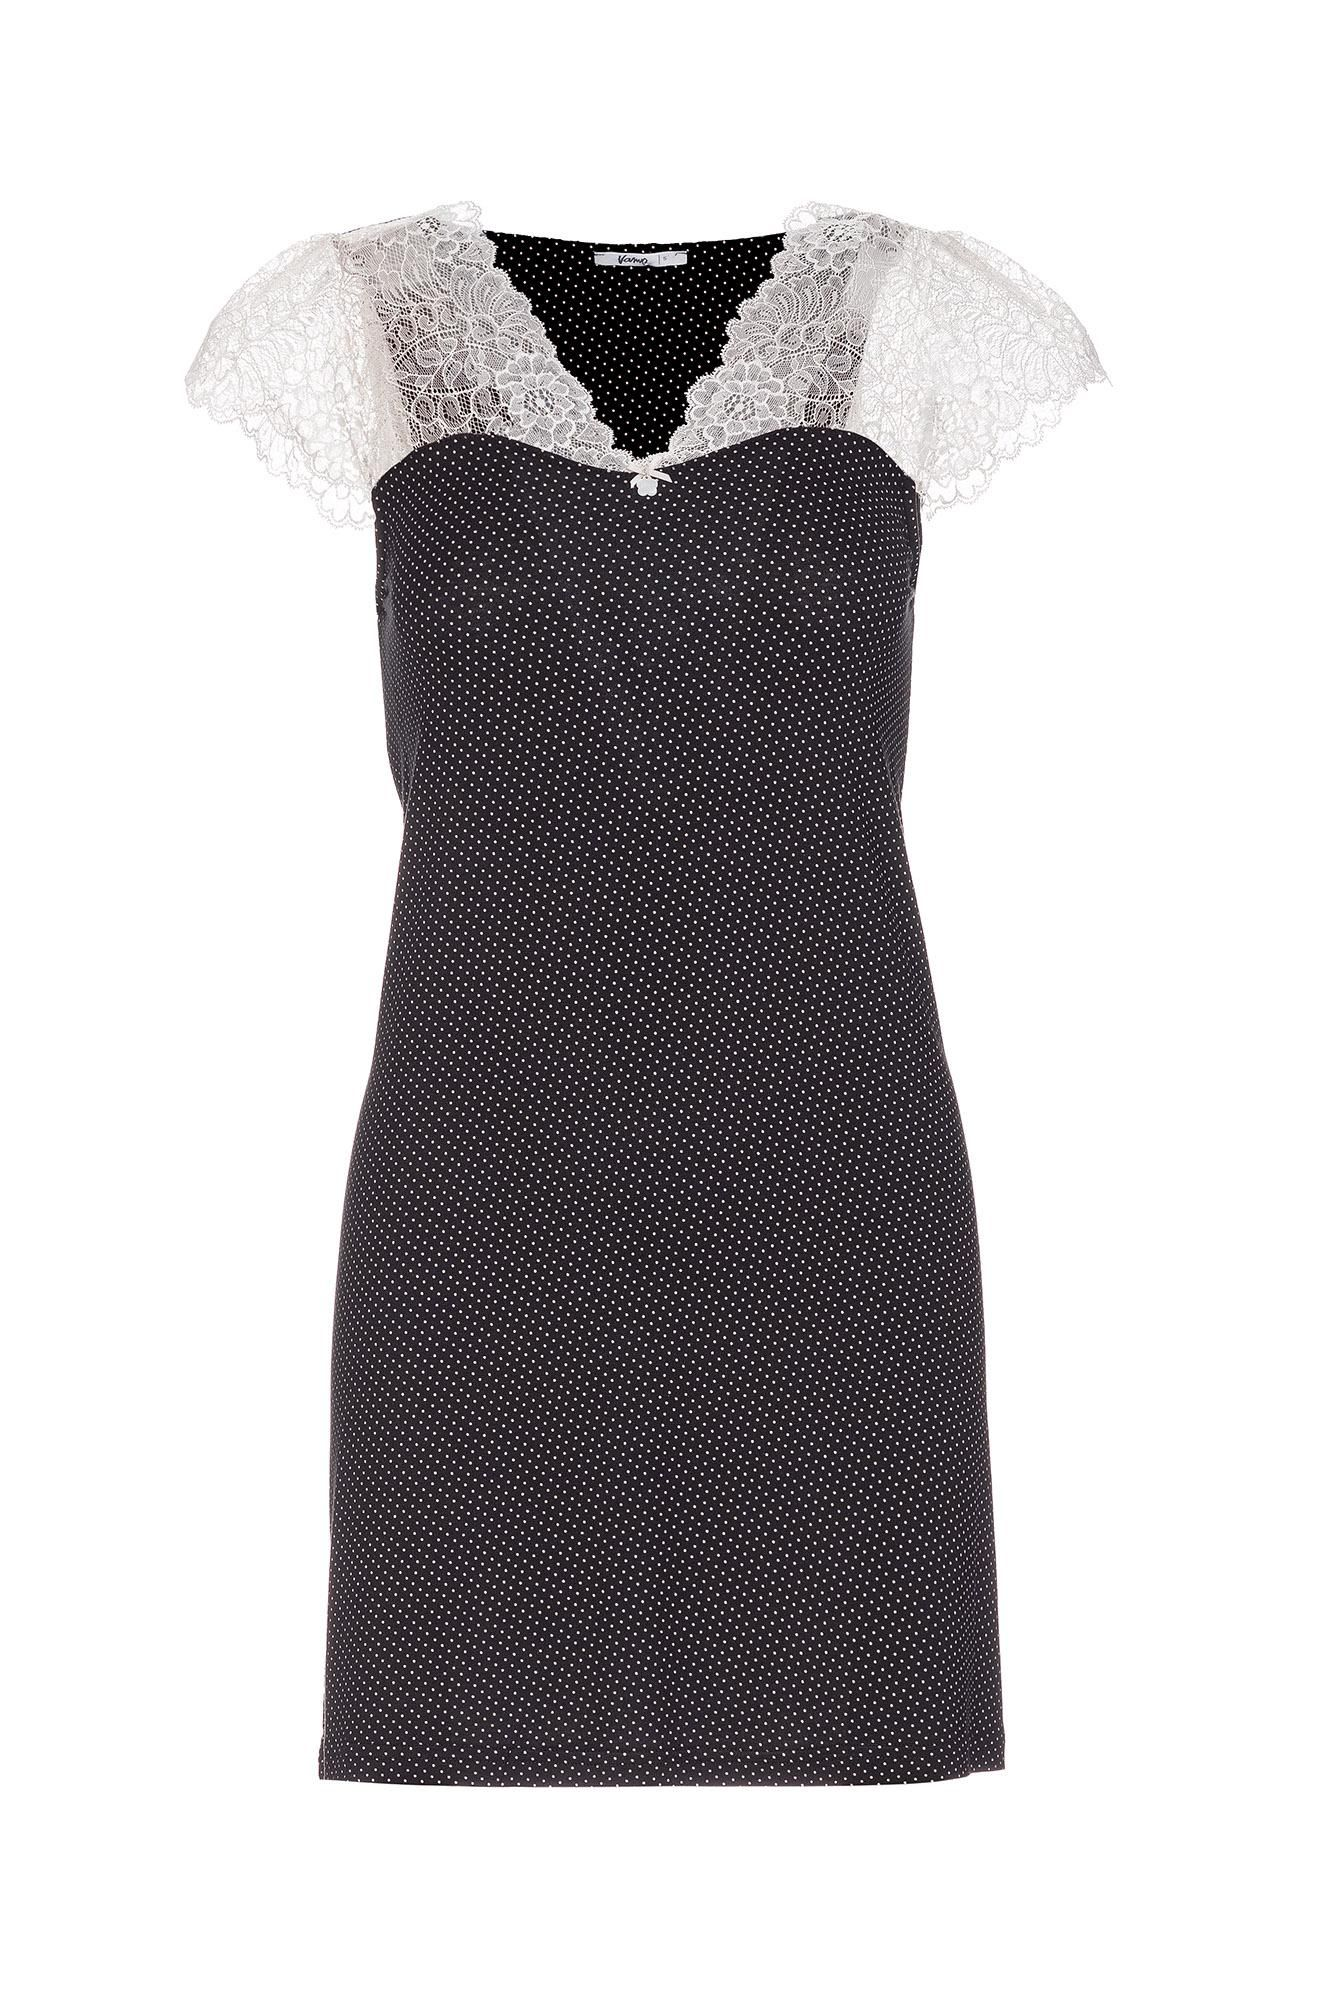 Women's Polka Dot Nightgown